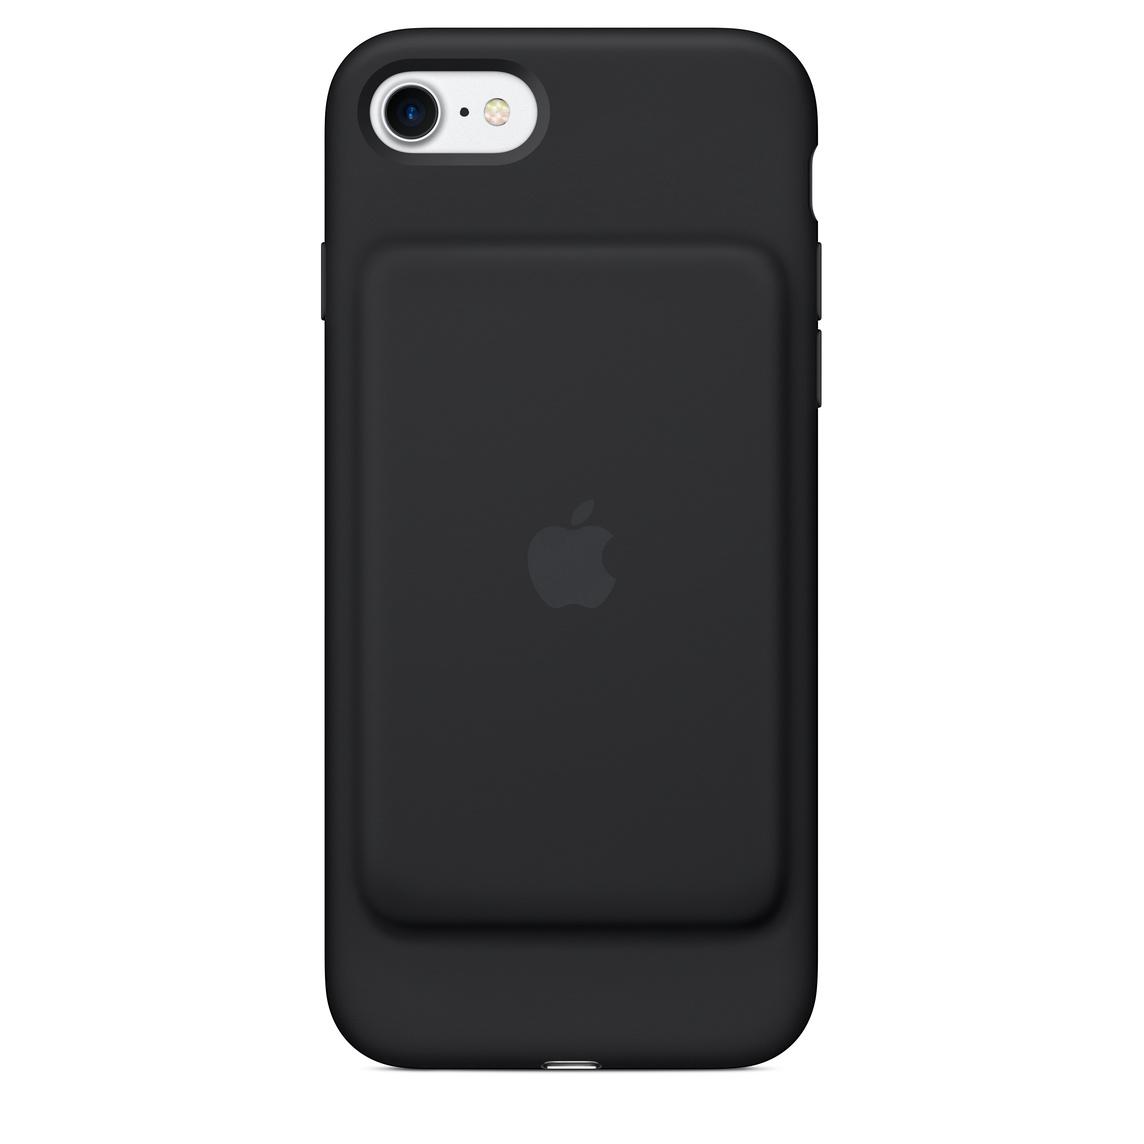 the best attitude 3a9f2 db86e iPhone 7 Smart Battery Case - Black